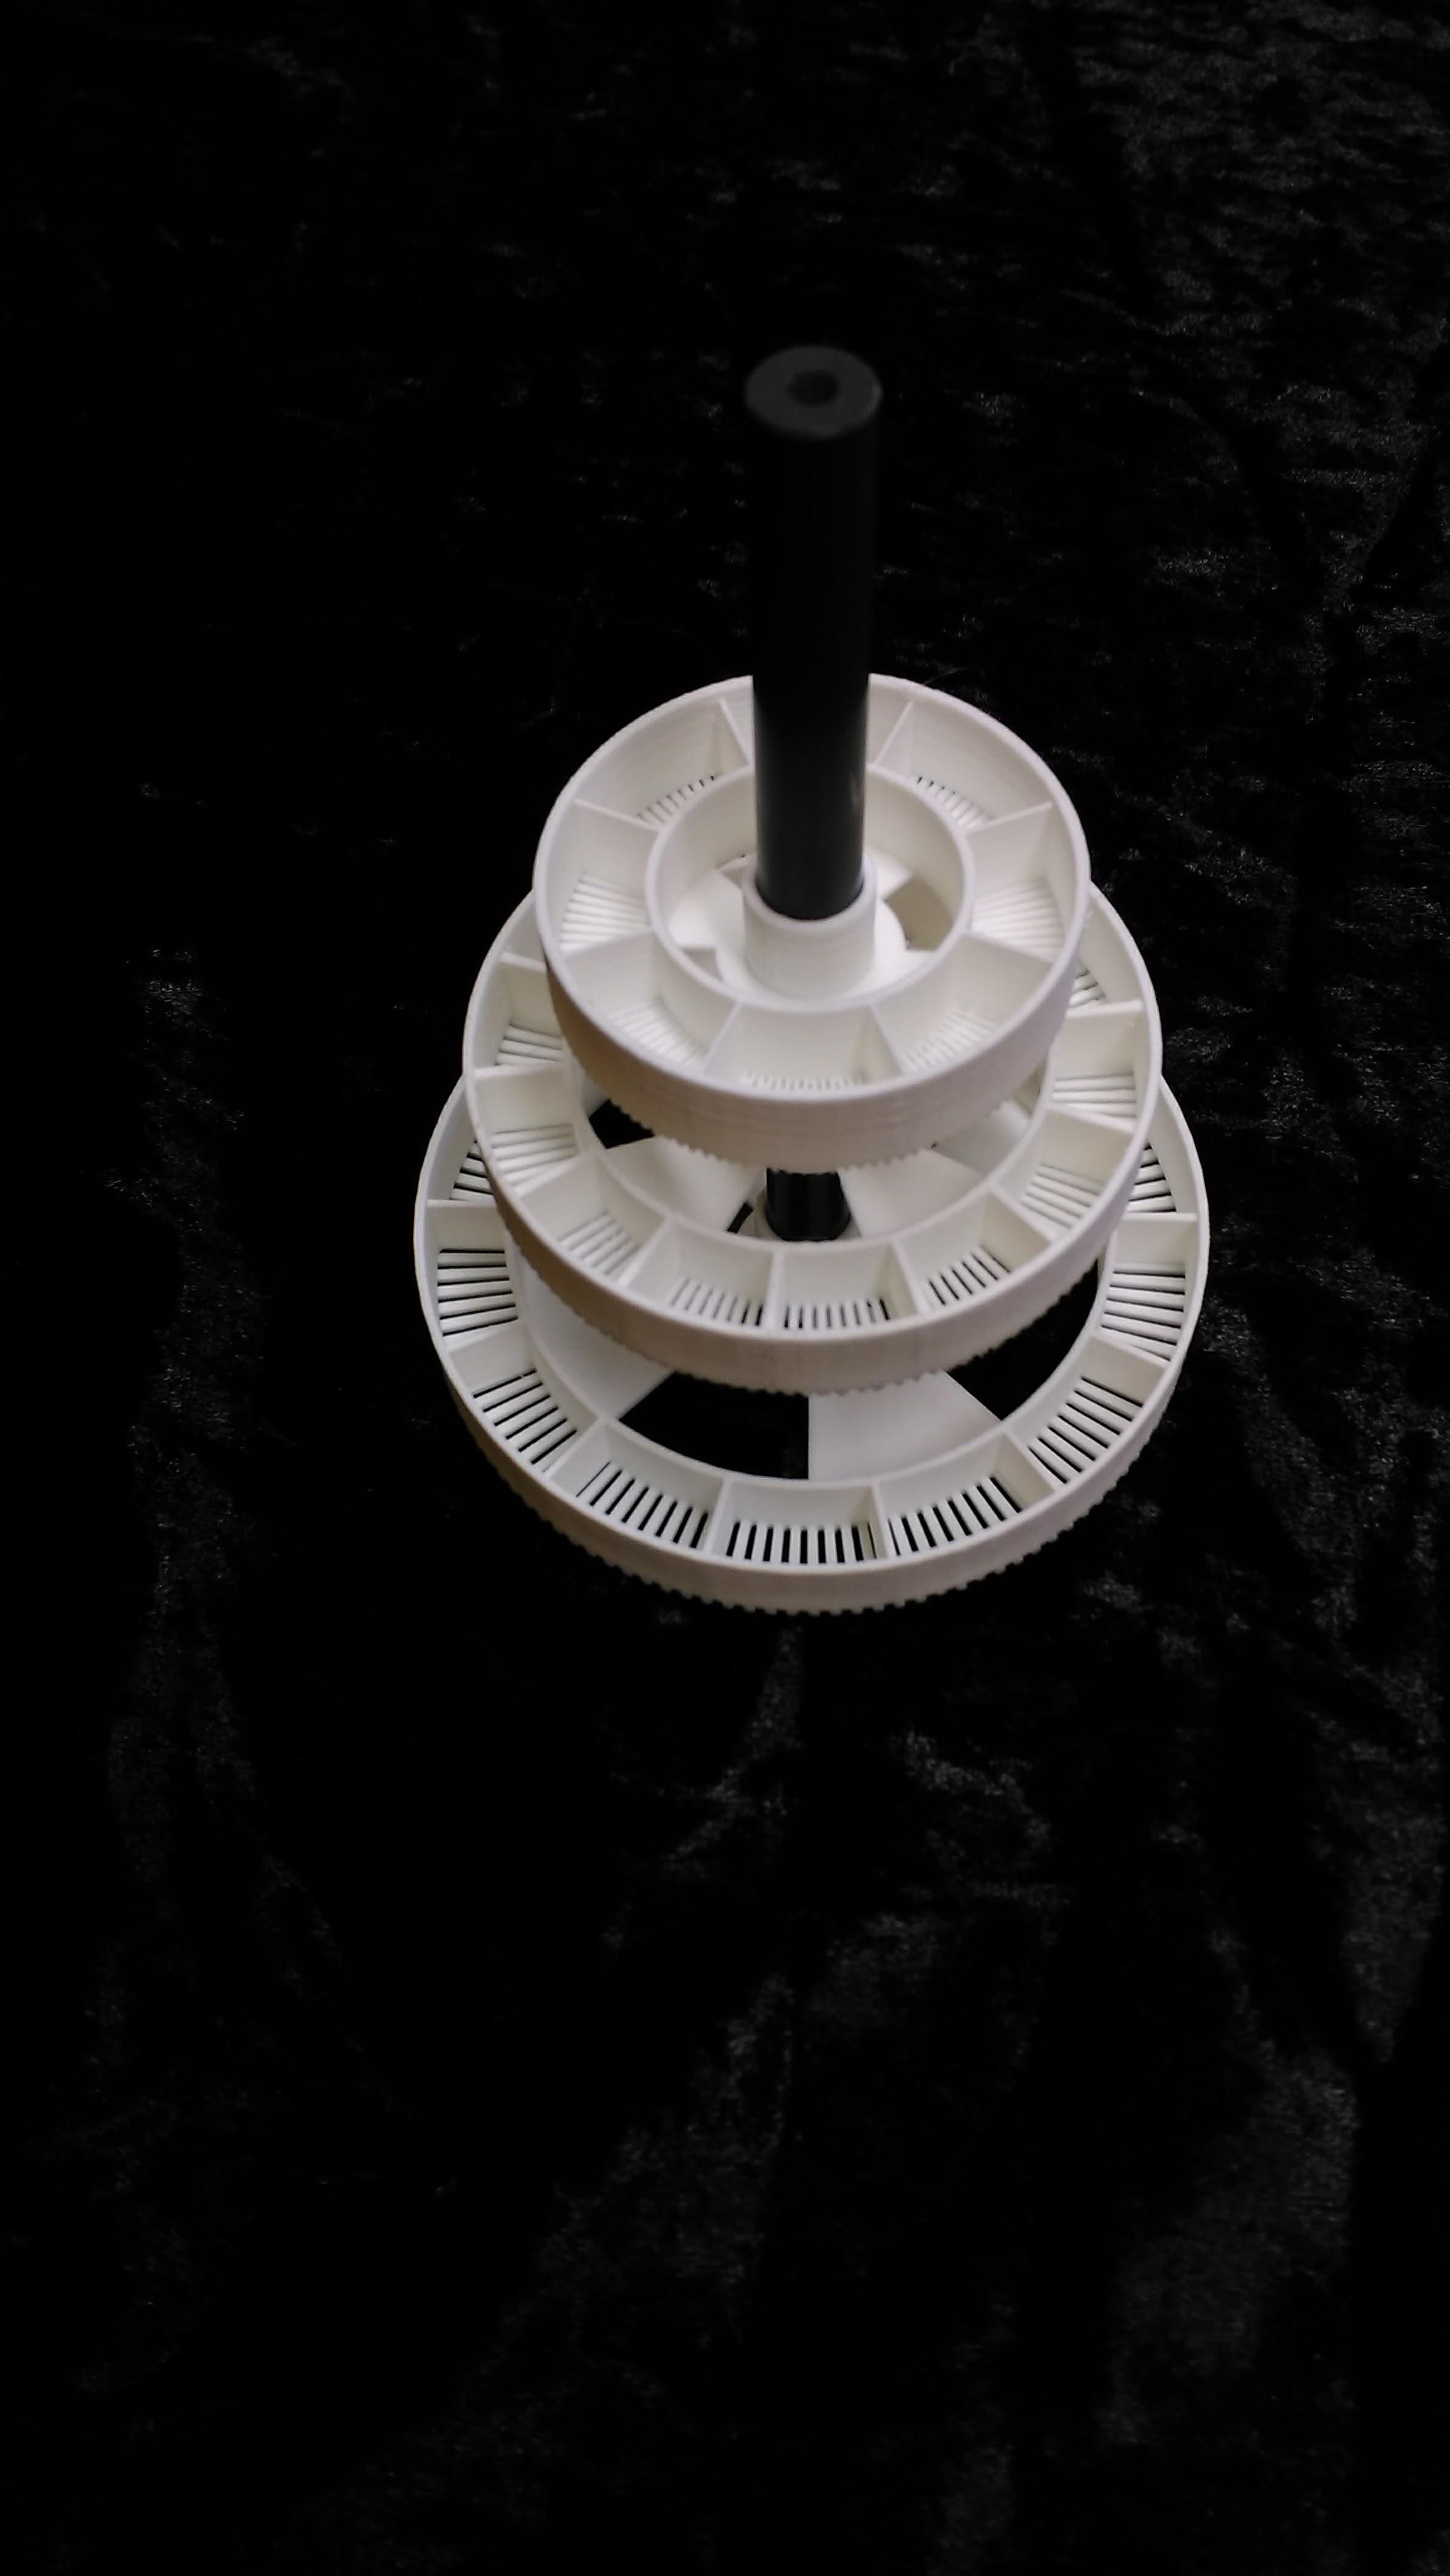 3d projekte 3d drucker mechanische werkstatt physikalisches institut. Black Bedroom Furniture Sets. Home Design Ideas